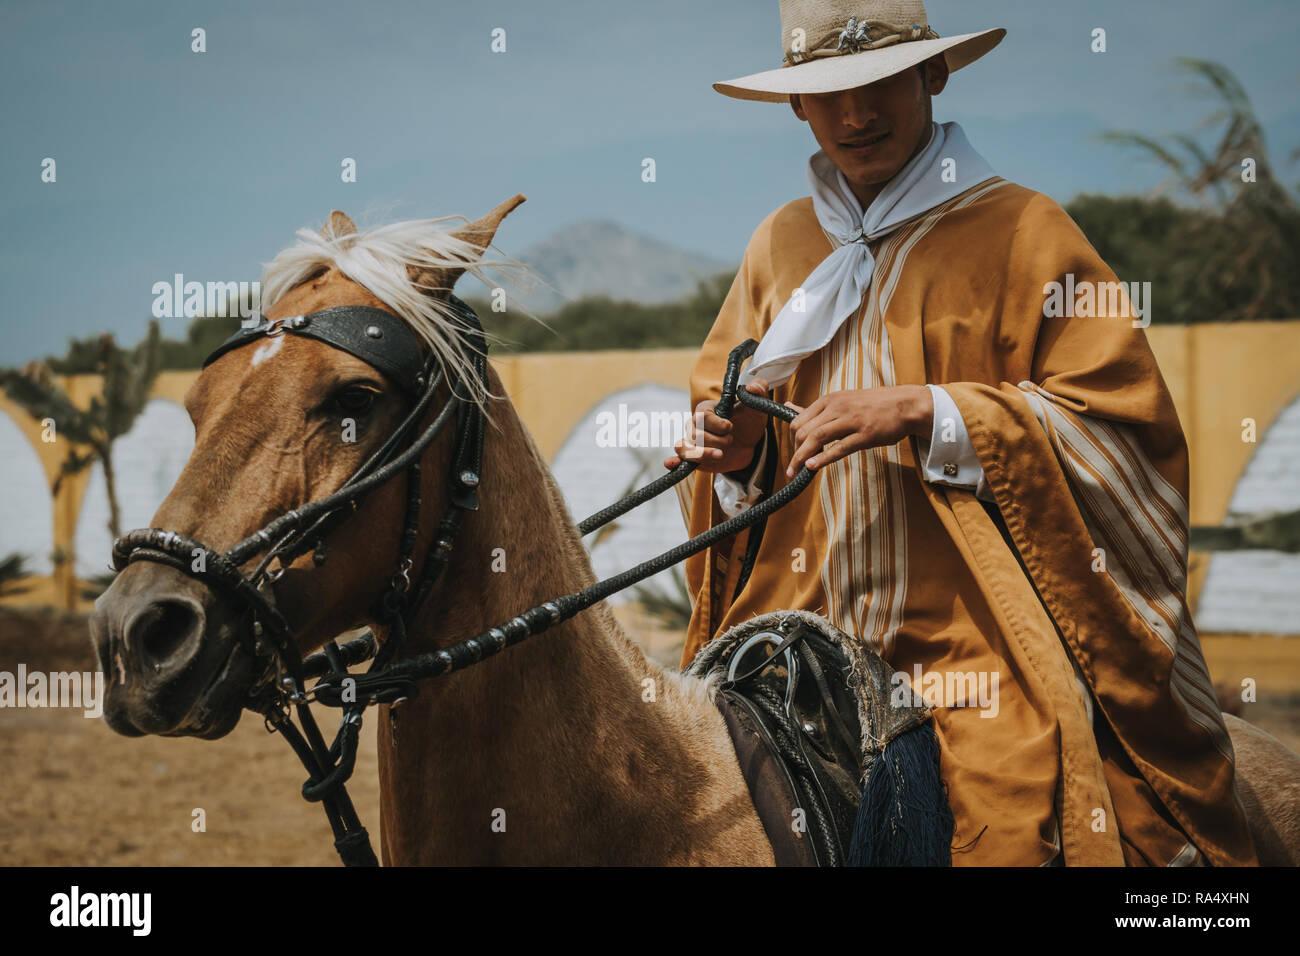 TRUJILLO, PERU - SEPTEMBER 2018 : Man in traditional clothes riding on a horse in a close up portrait, Trujillo, Peru Stock Photo